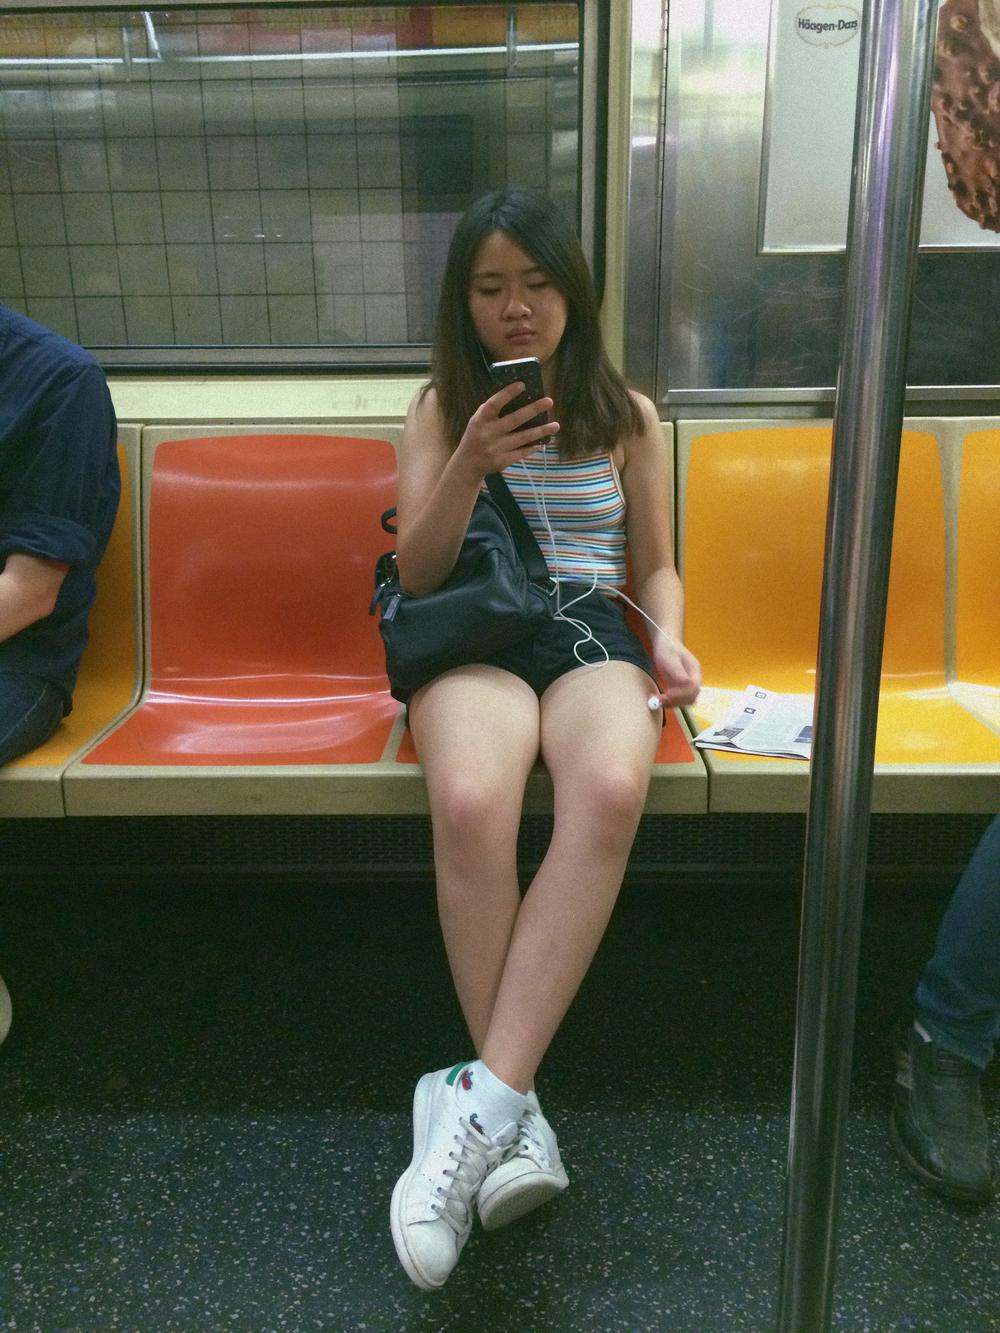 Milk on Subway, June 2016